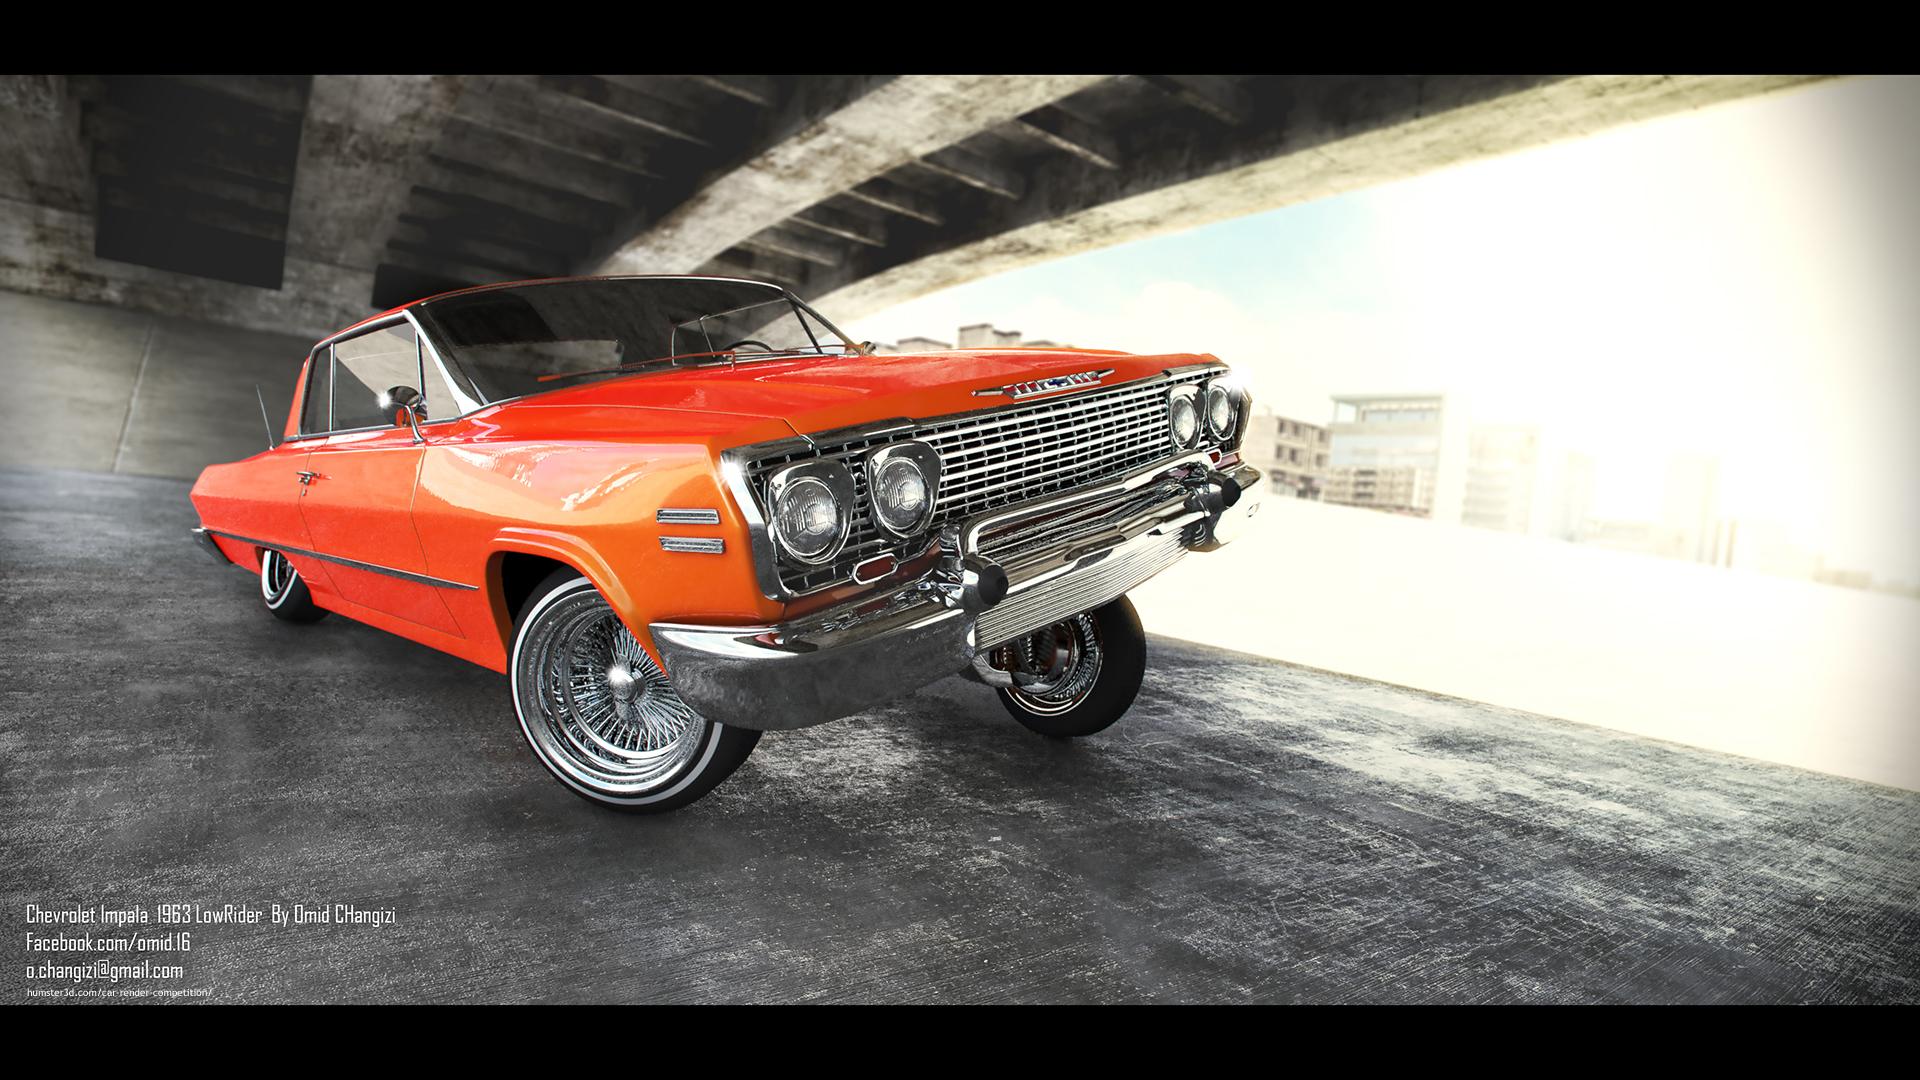 Chevrolet Impala 1963 LowRider 3d art